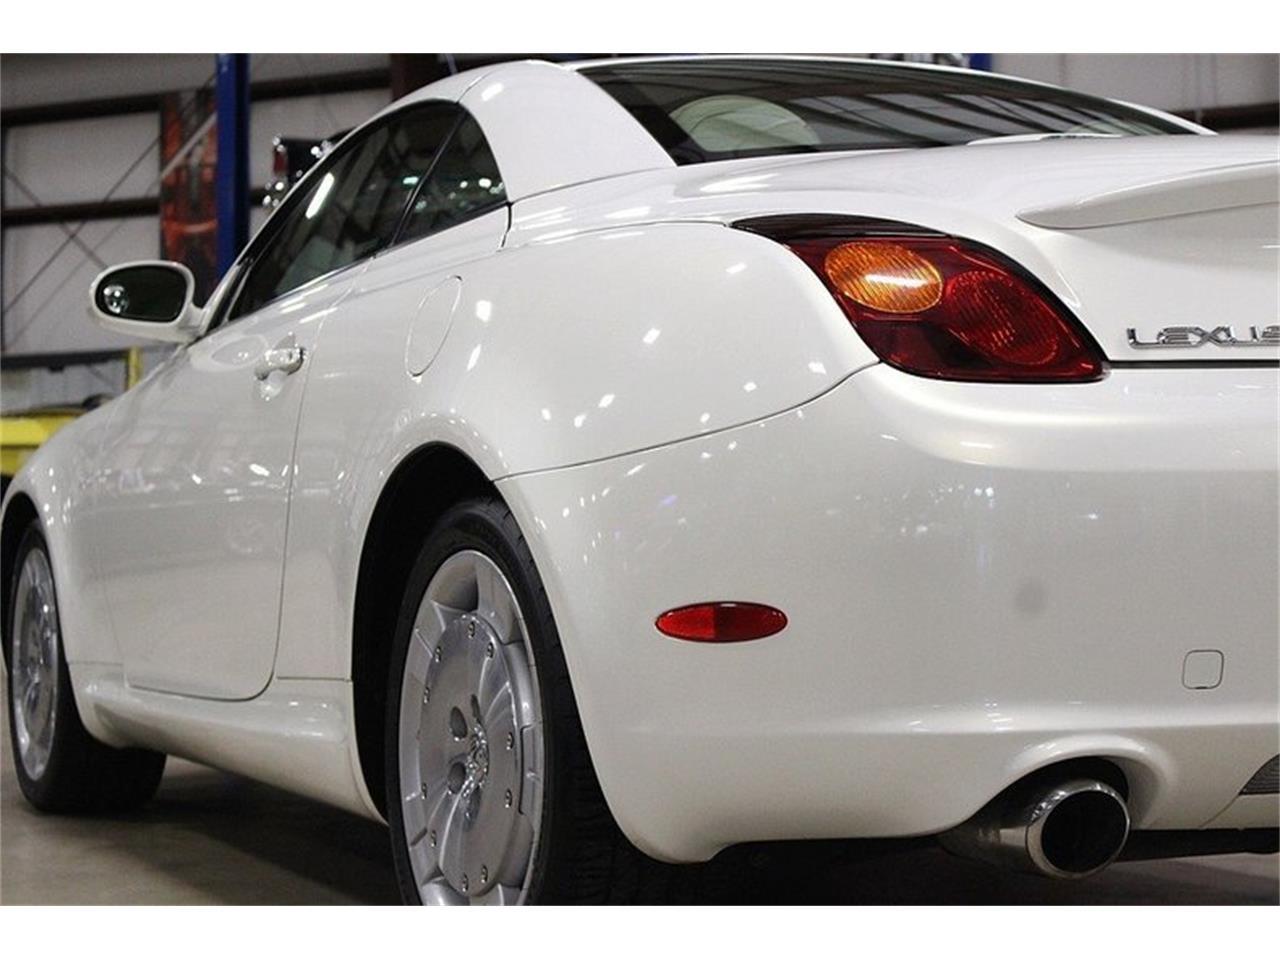 For Sale: 2003 Lexus SC430 in Kentwood, Michigan